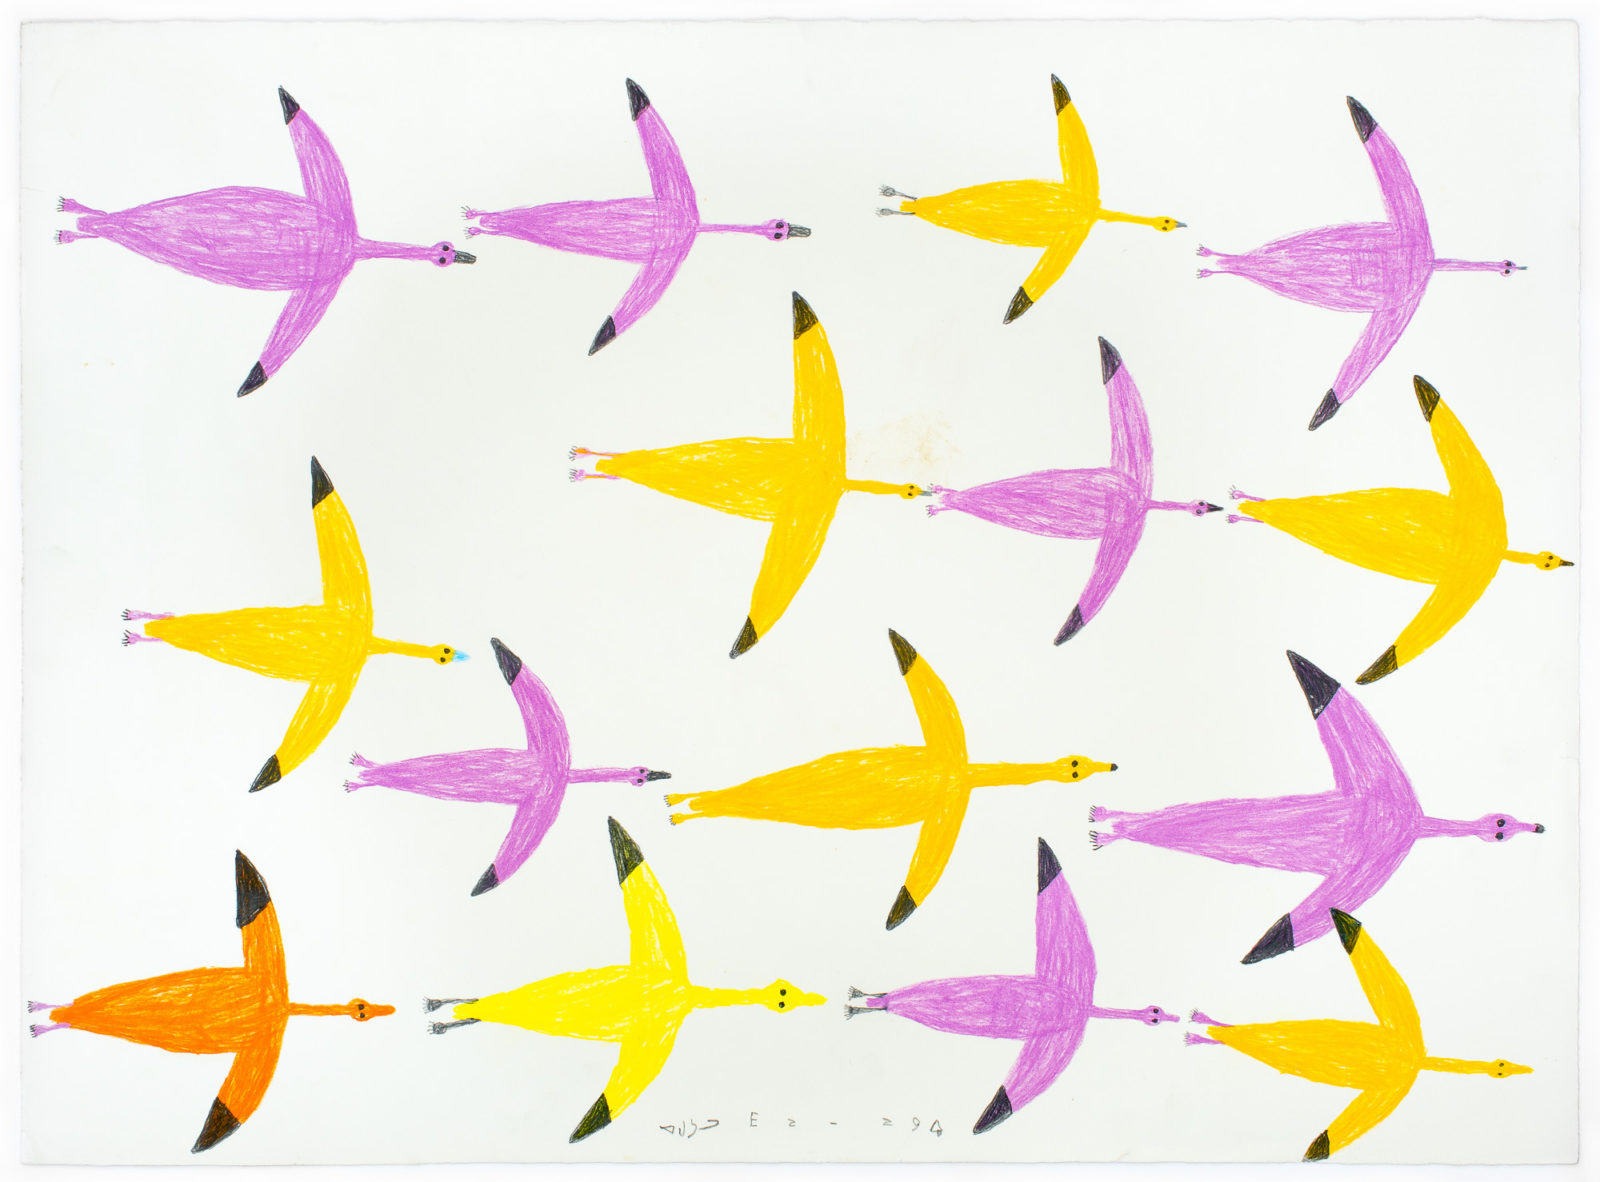 Luke Anguhadluq - untitled (birds in flight)